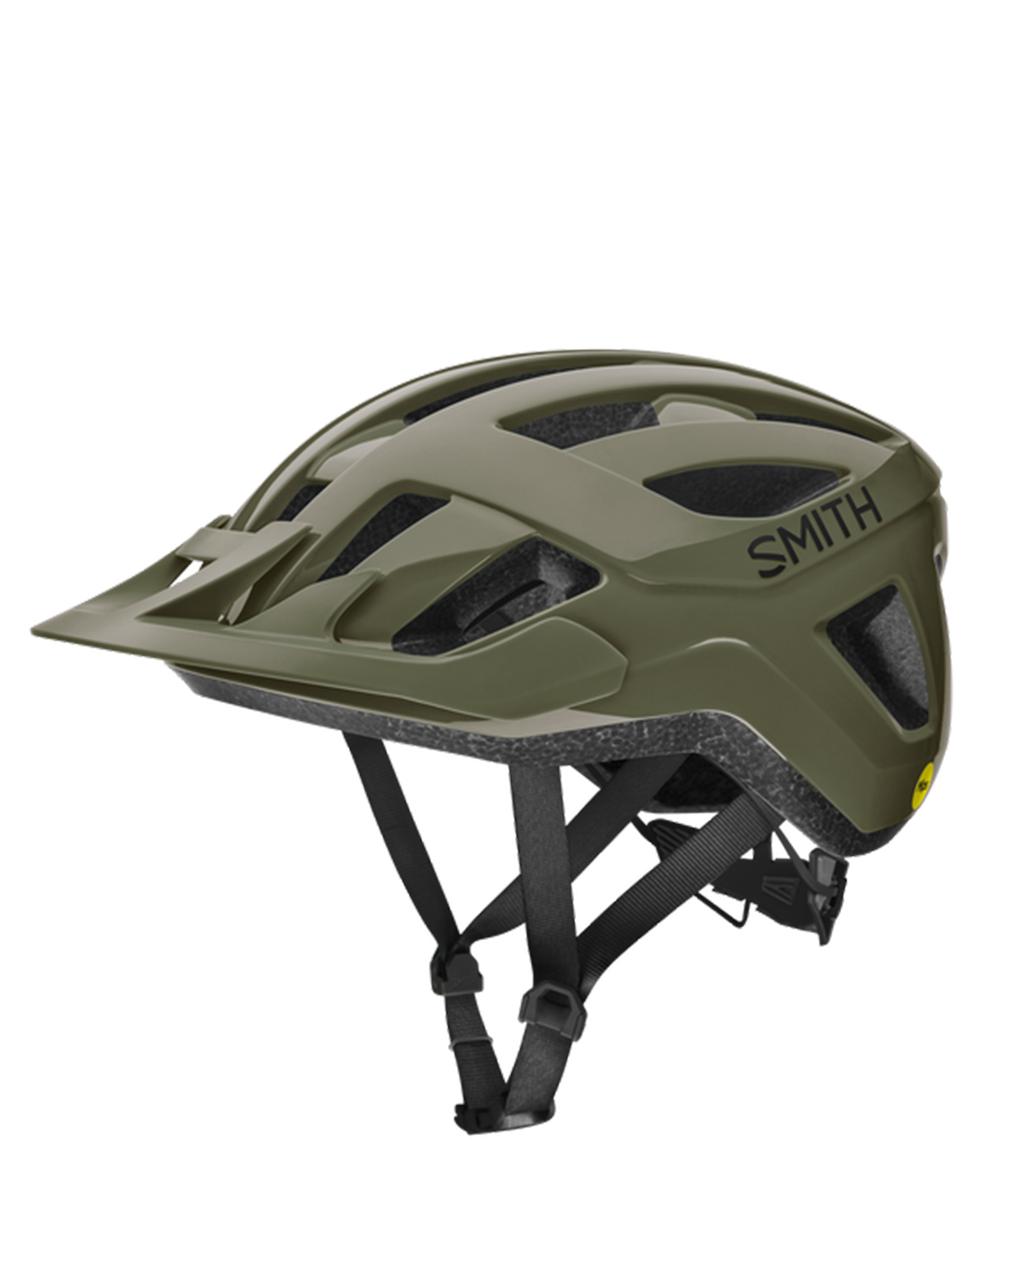 SMITHOPTICS Smith Wilder Jr Helmet